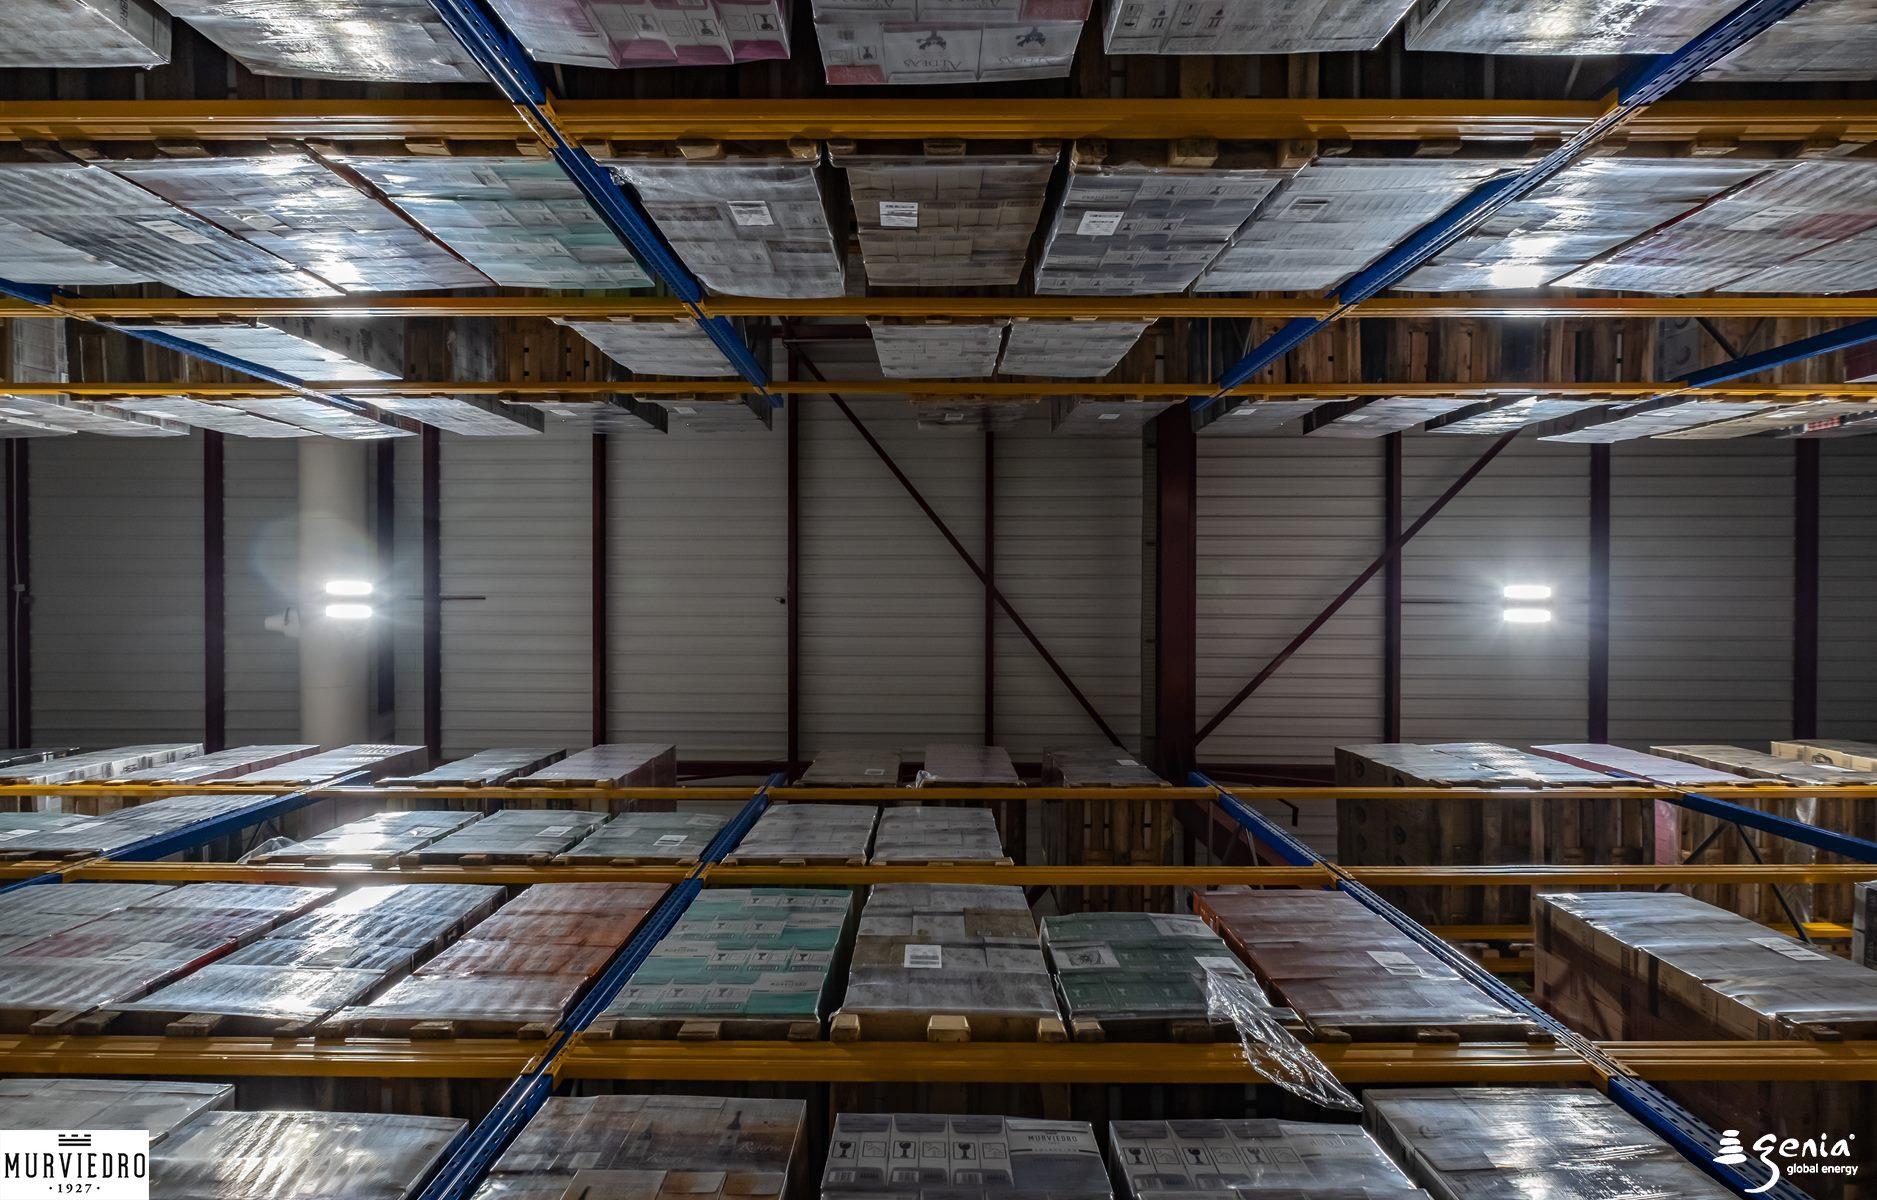 iluminacion-inteligente-bodegas-murviedro-pasillos-almacenamiento-y-logistica